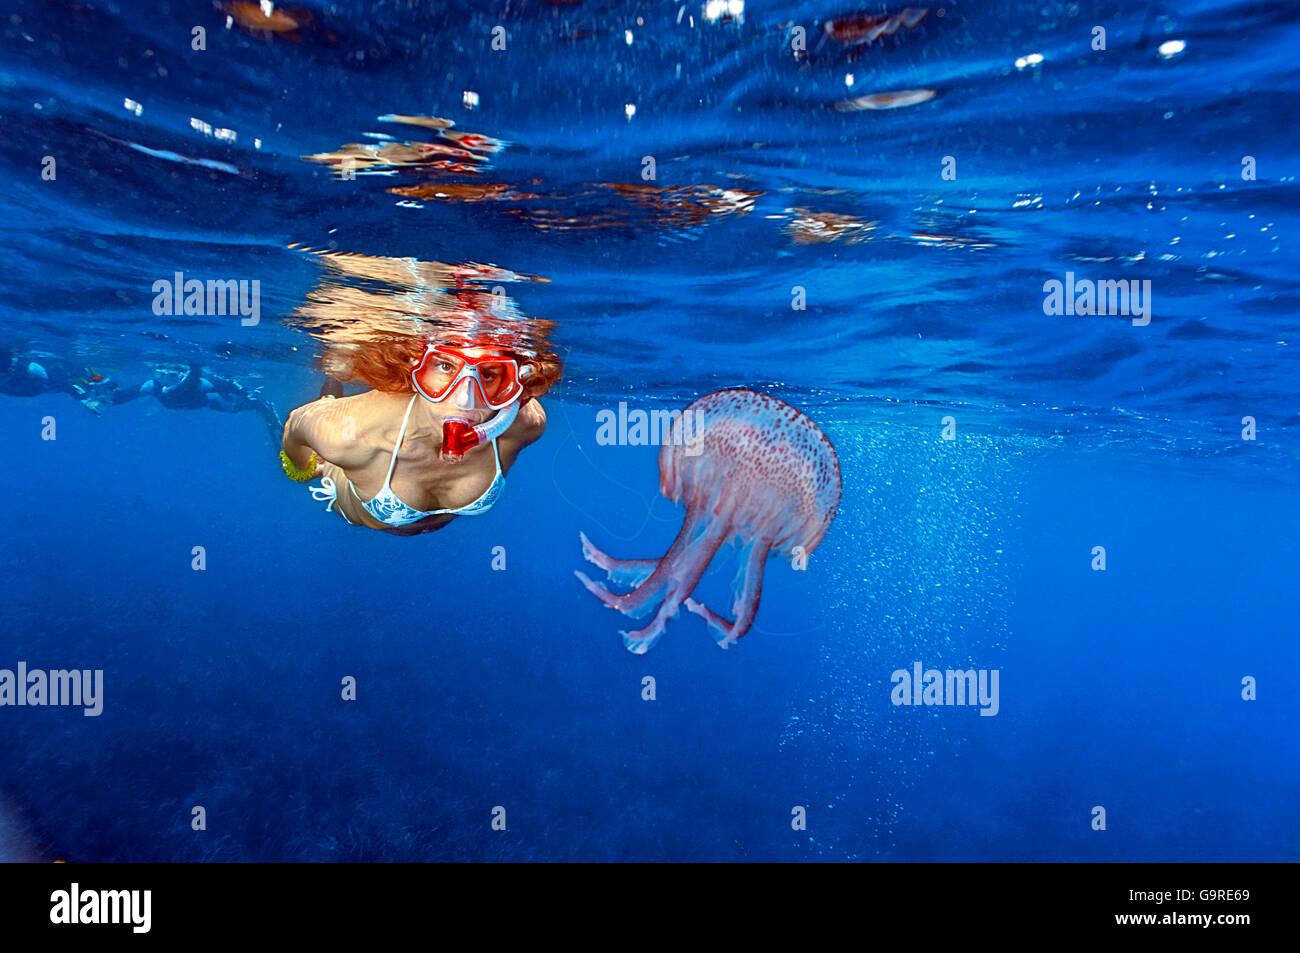 Snorkeler with Jellyfish / (Pelagia noctiluca) - Stock Image